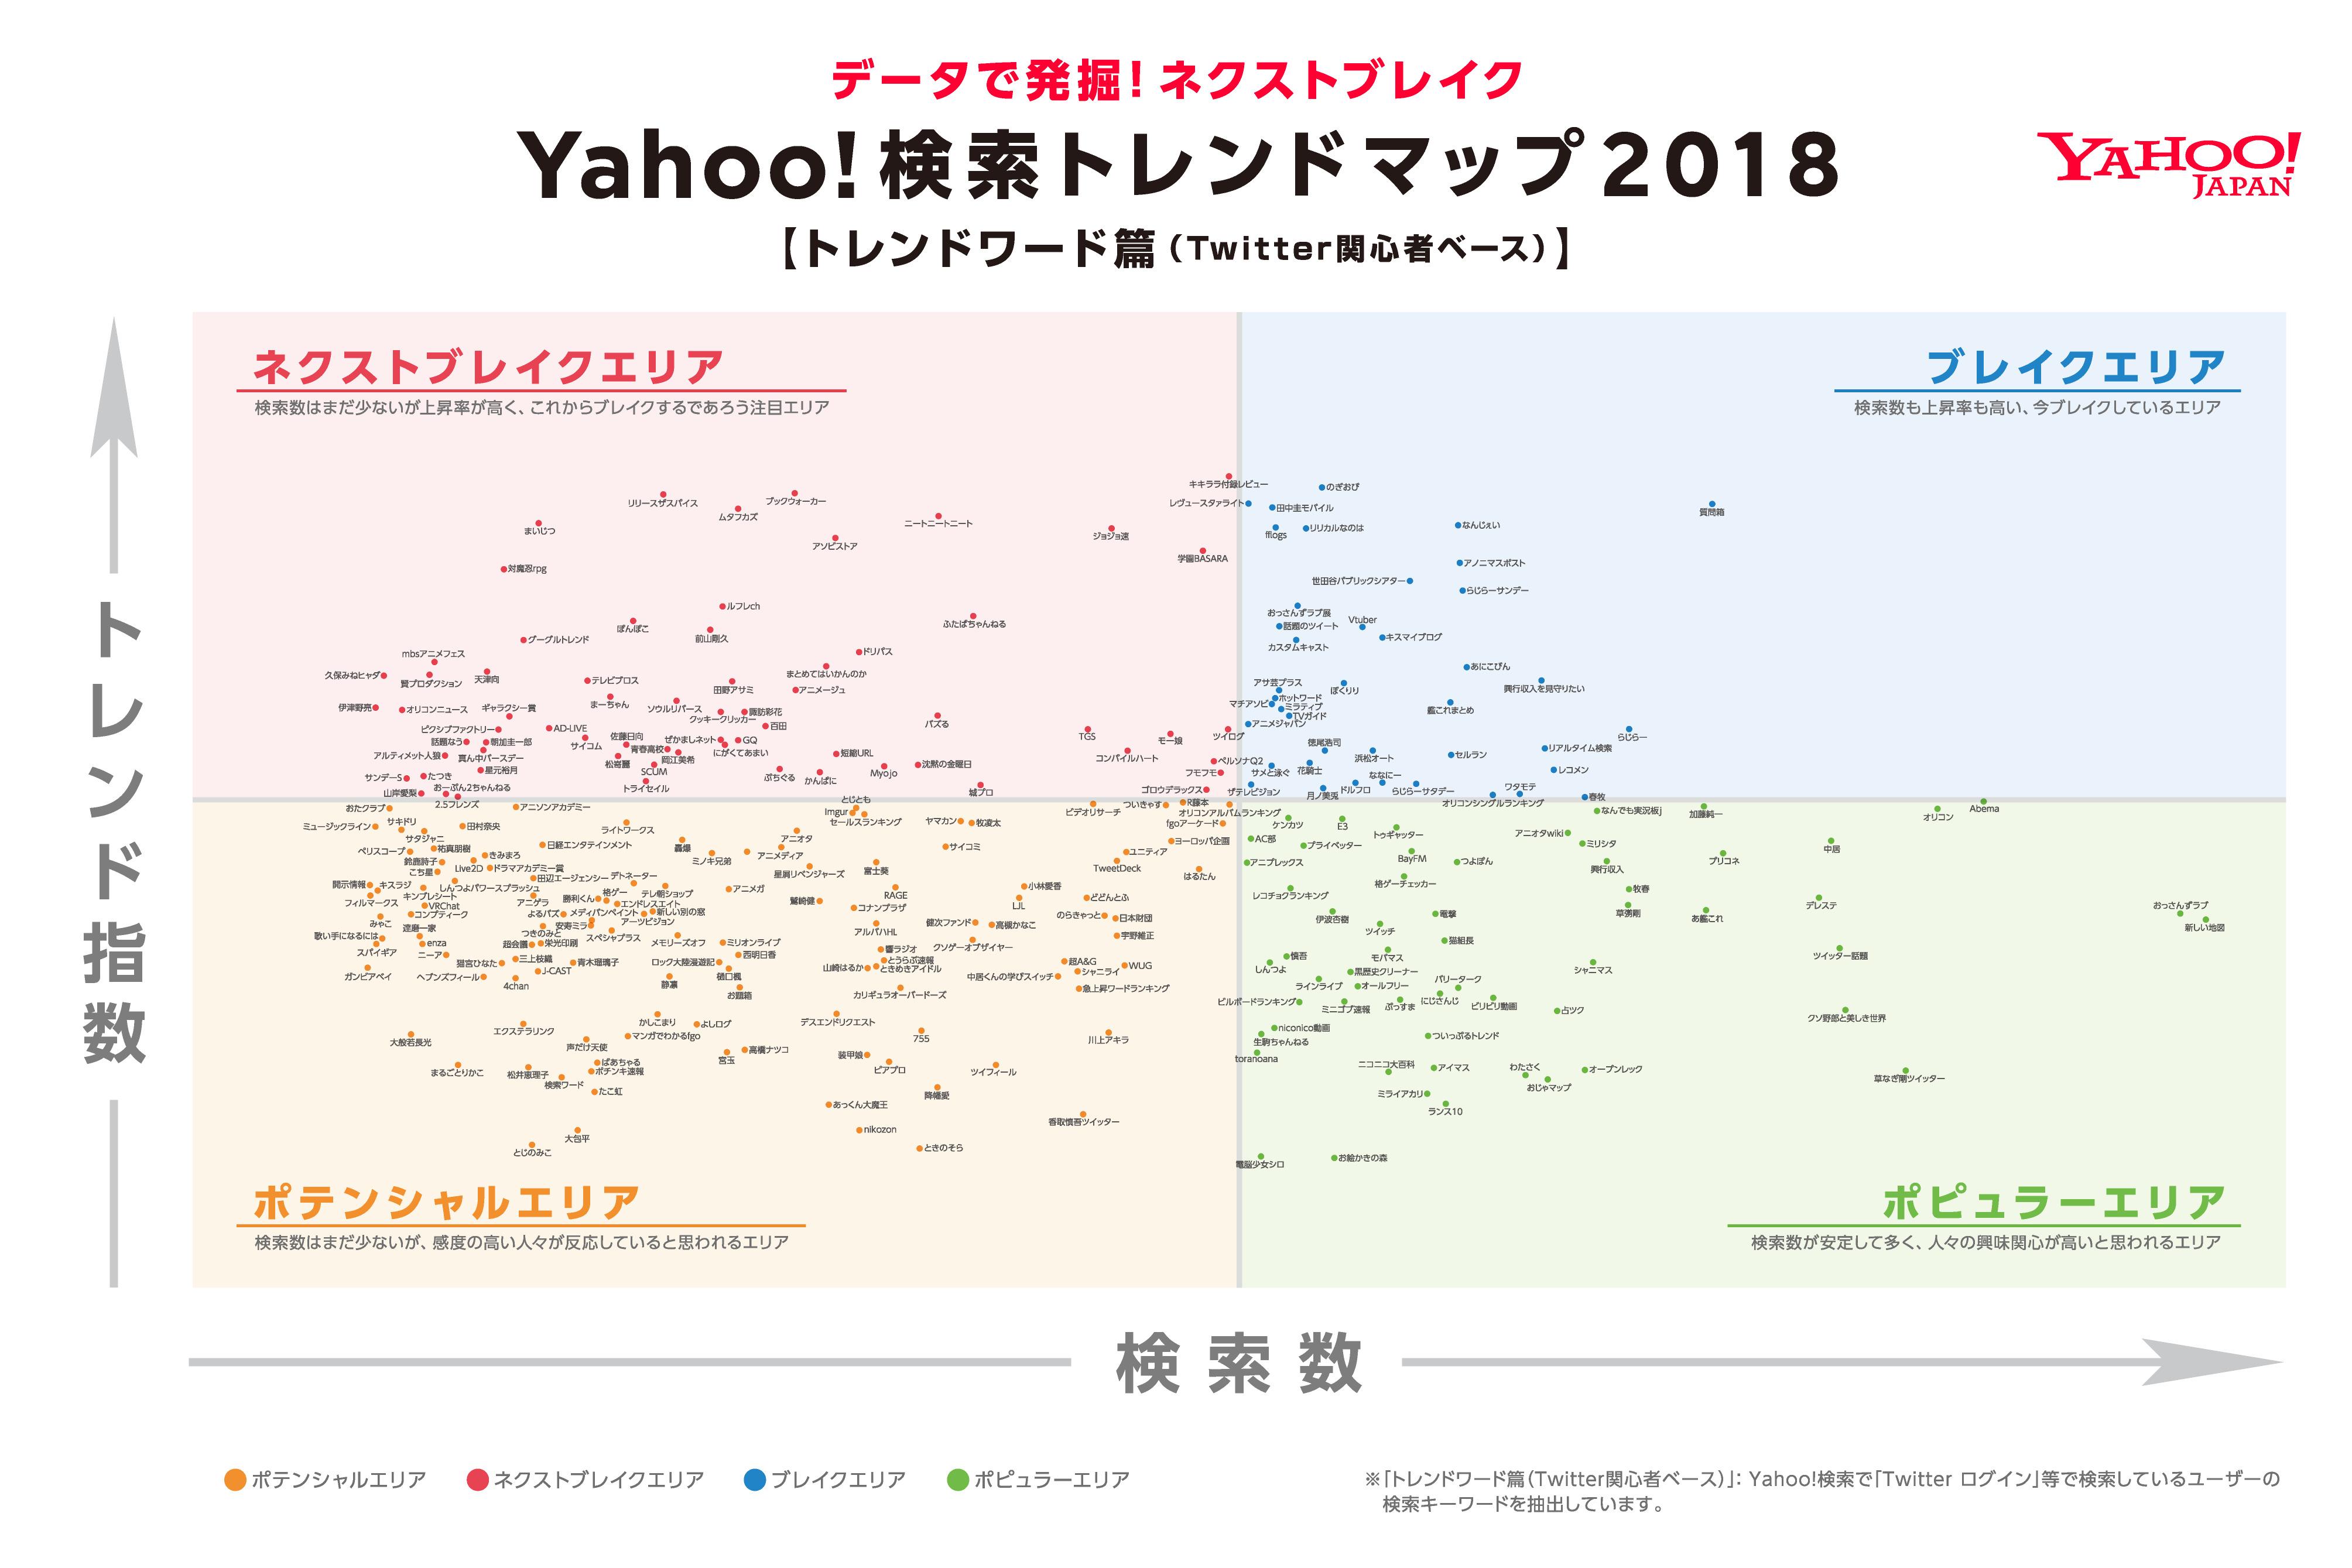 Yahoo!検索トレンドマップ2018 トレンドワード篇(Twitter関心者ベース)